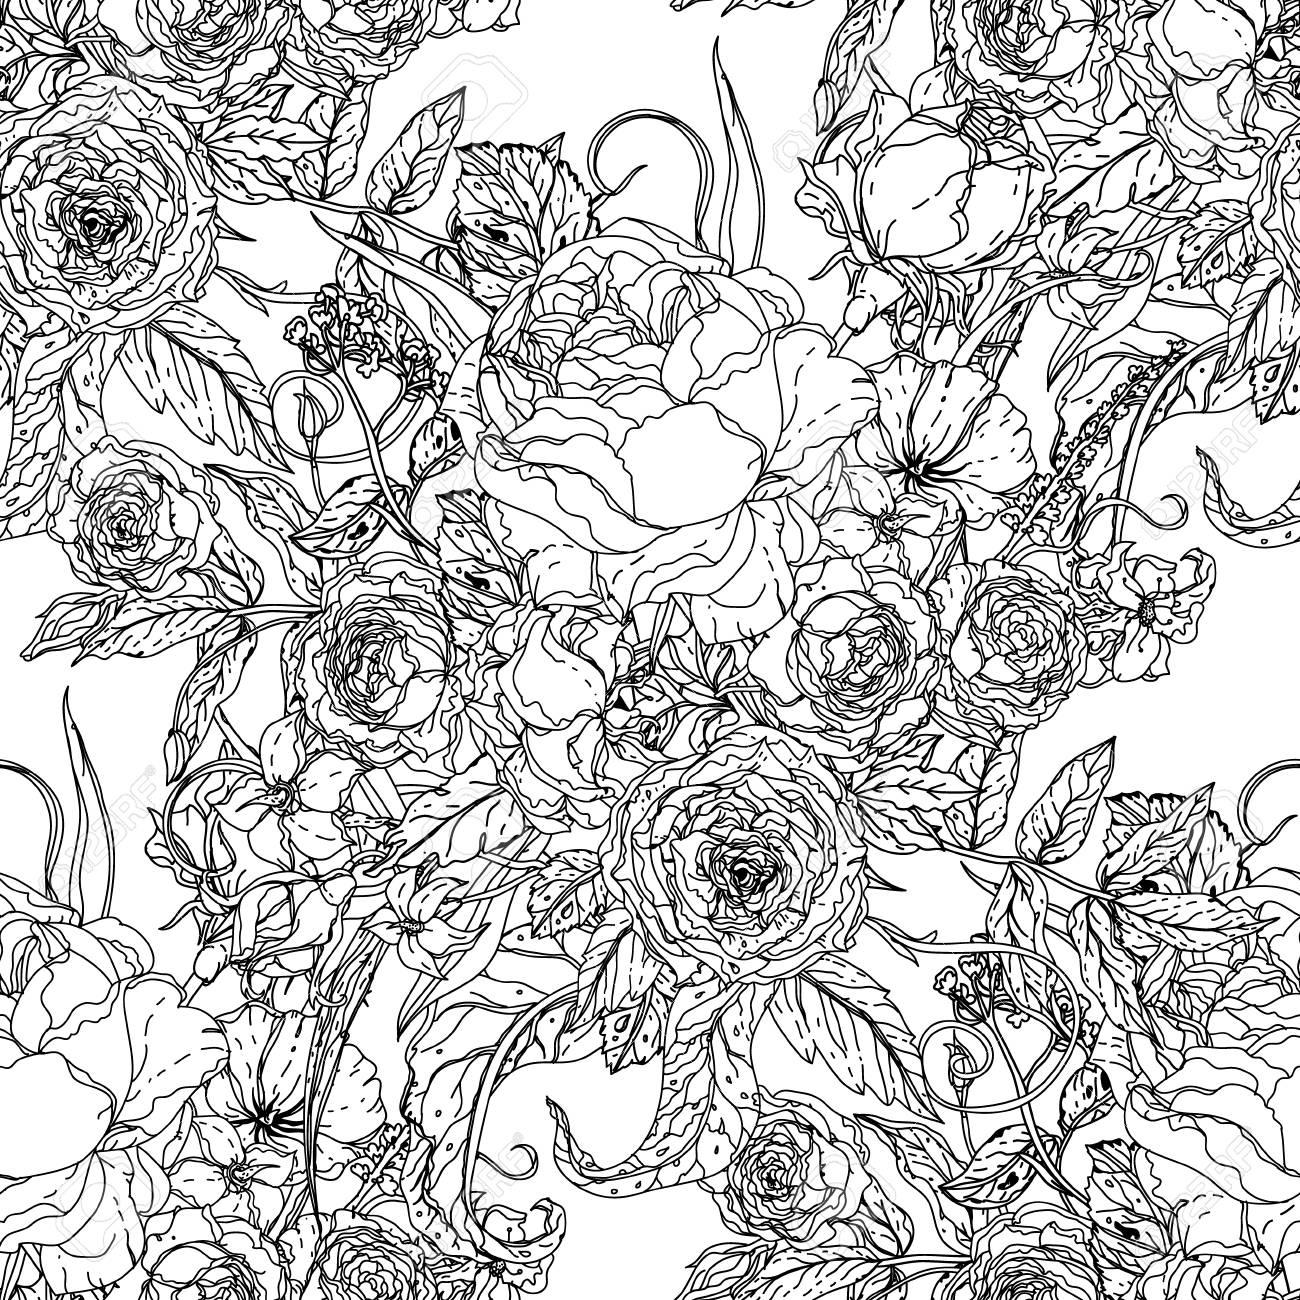 Estilo De Libro Para Adultos Modelo Inconsútil De Las Rosas Para Colorear Para Colorear Para Adultos En Estilo Zenart Famosa Dibujado A Mano Retro